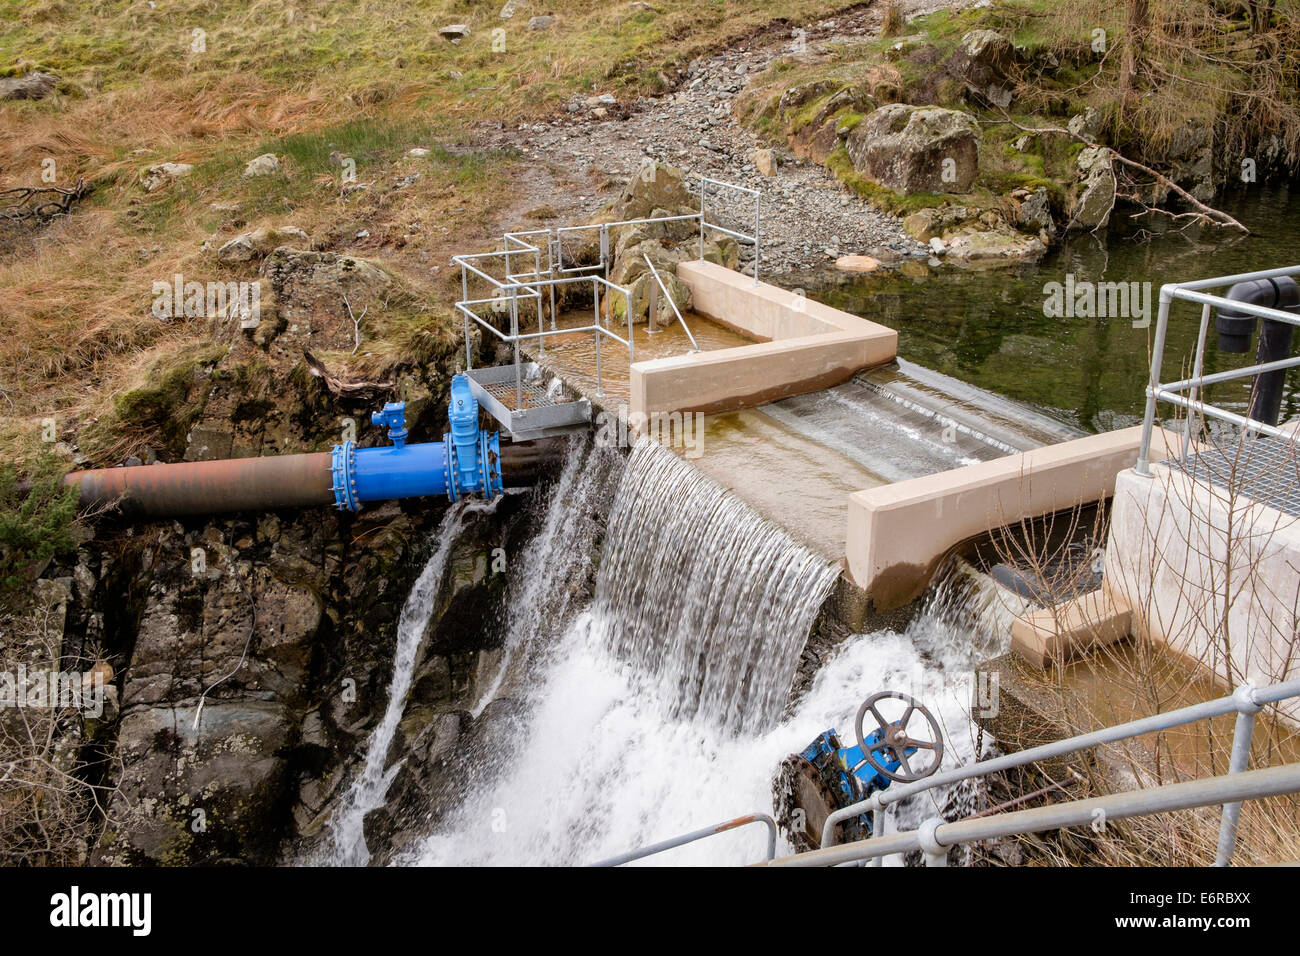 TES small hydro generator - Susasca, Switzerland - YouTube